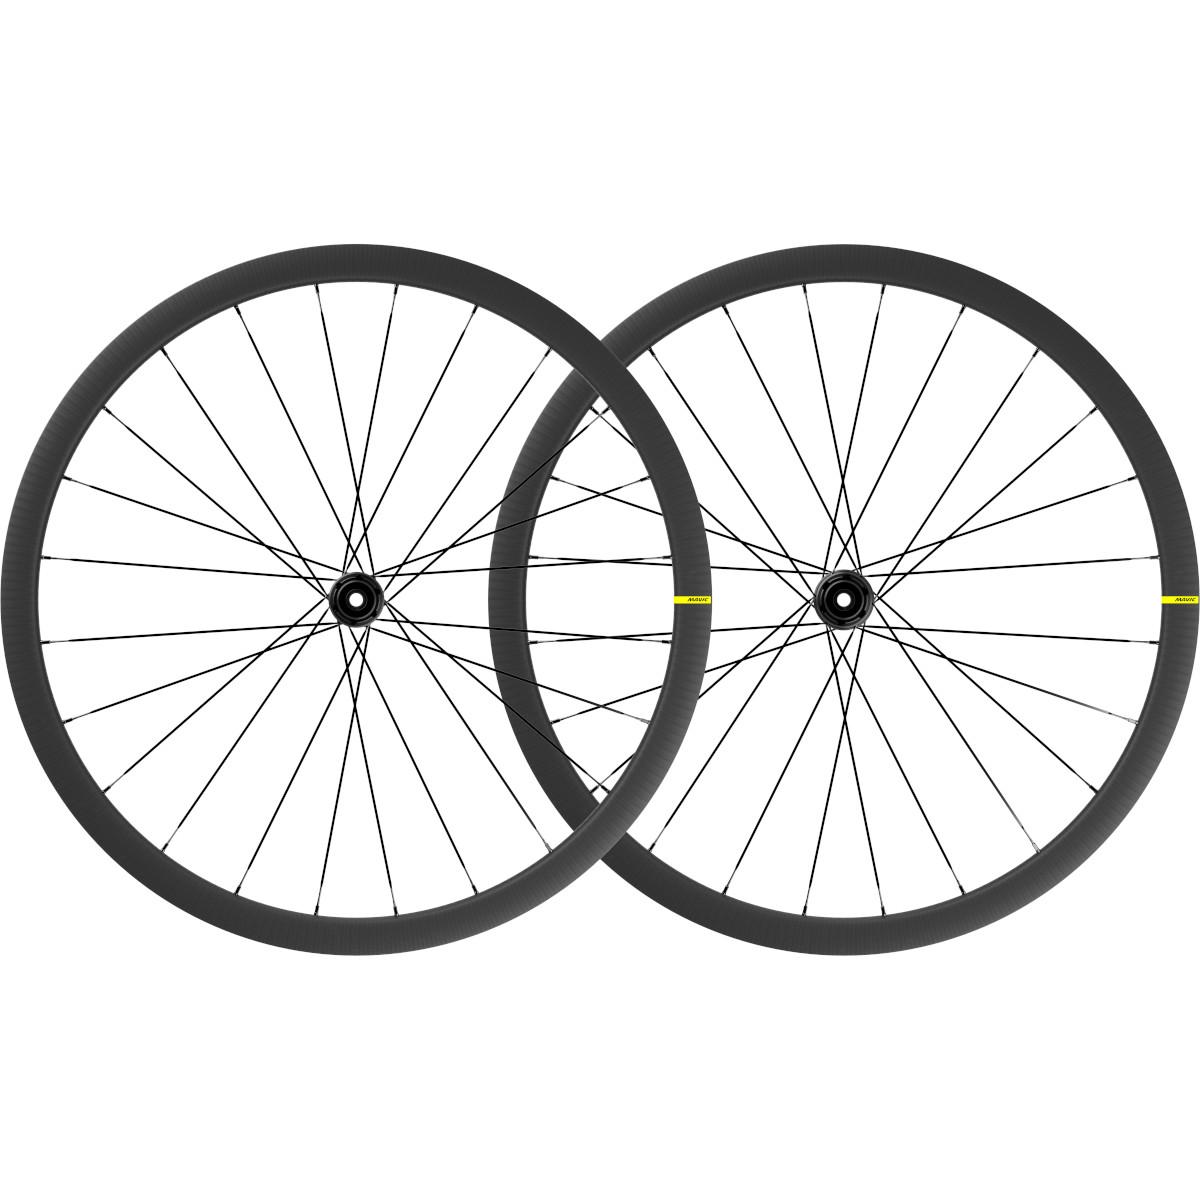 Mavic Cosmic SL 32 Disc Carbon UST Laufradsatz - Centerlock - VR: 12x100mm/QR | HR: 12x142mm/QR - Shimano HG